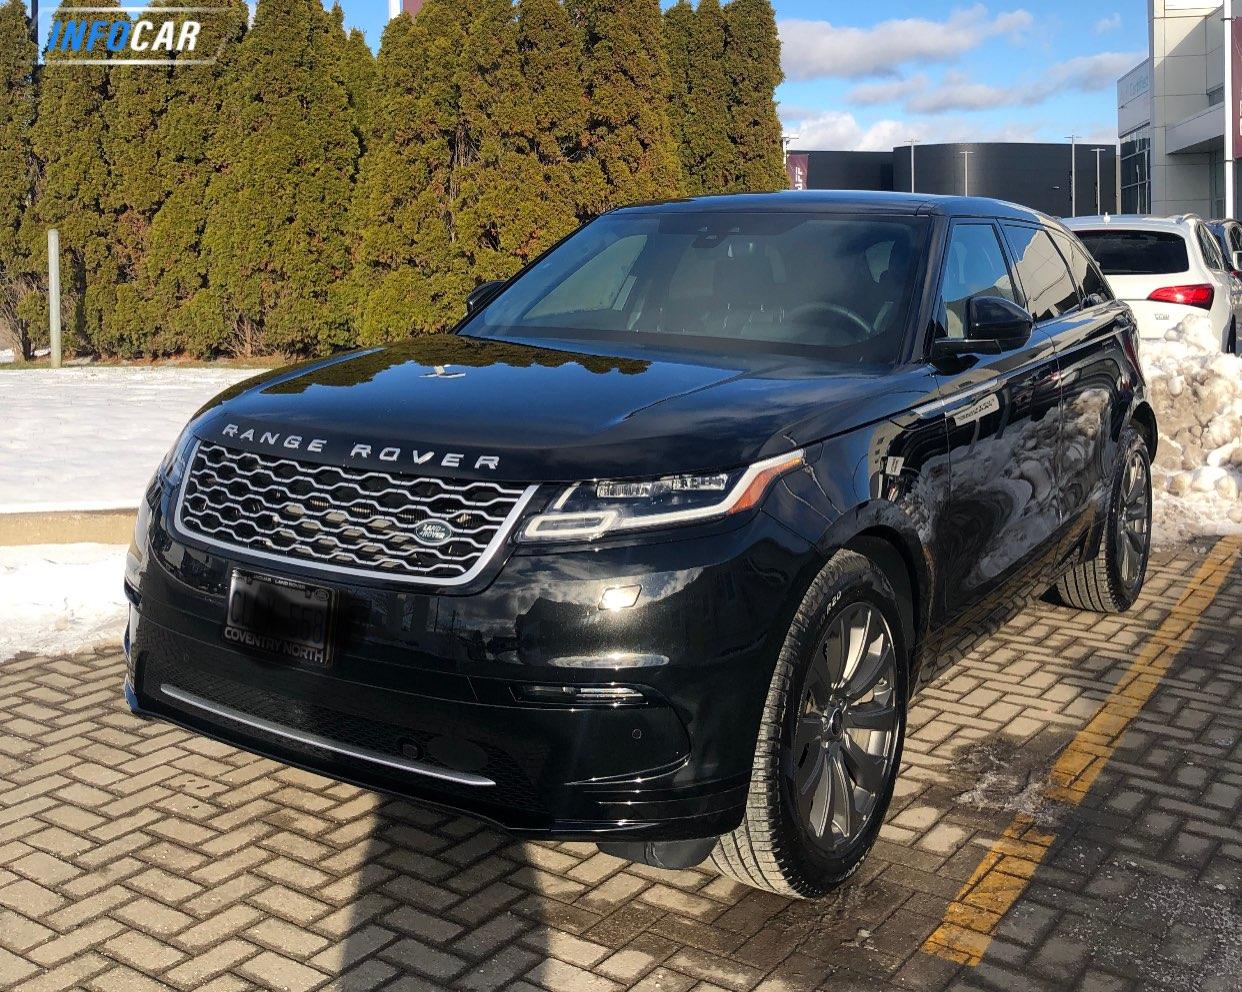 2020 Land Rover Range Rover Velar P250S - INFOCAR - Toronto's Most Comprehensive New and Used Auto Trading Platform